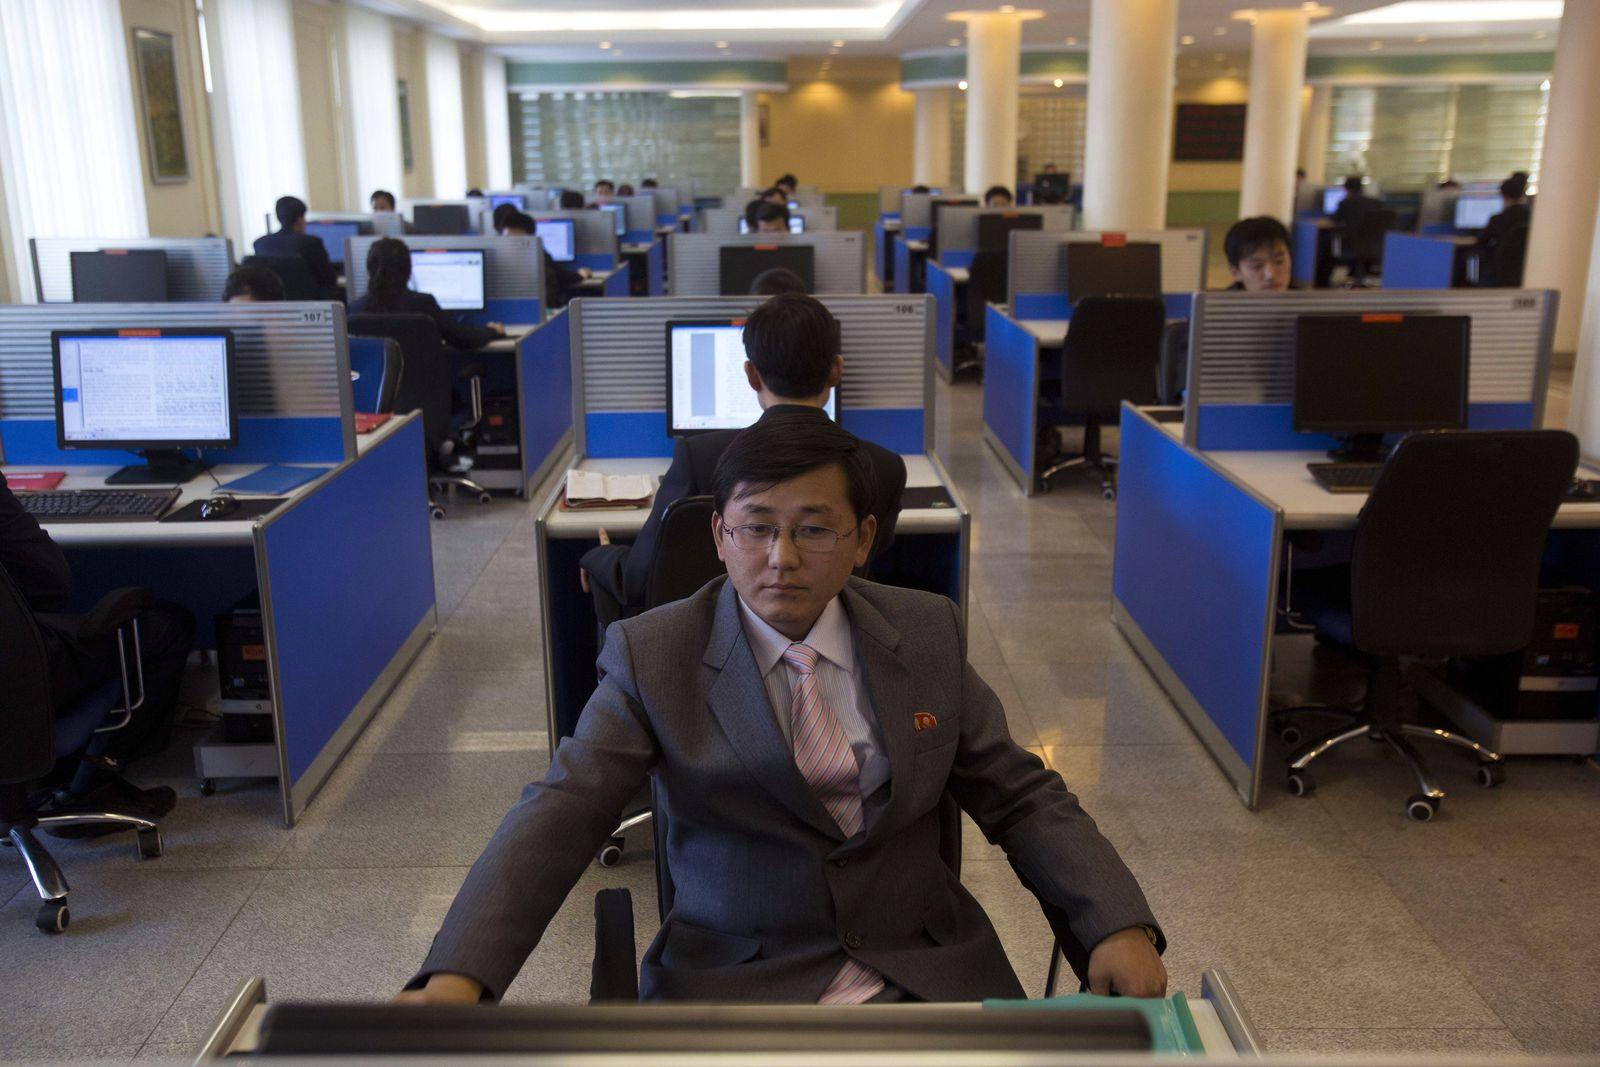 North Korea Surfing the Intranet